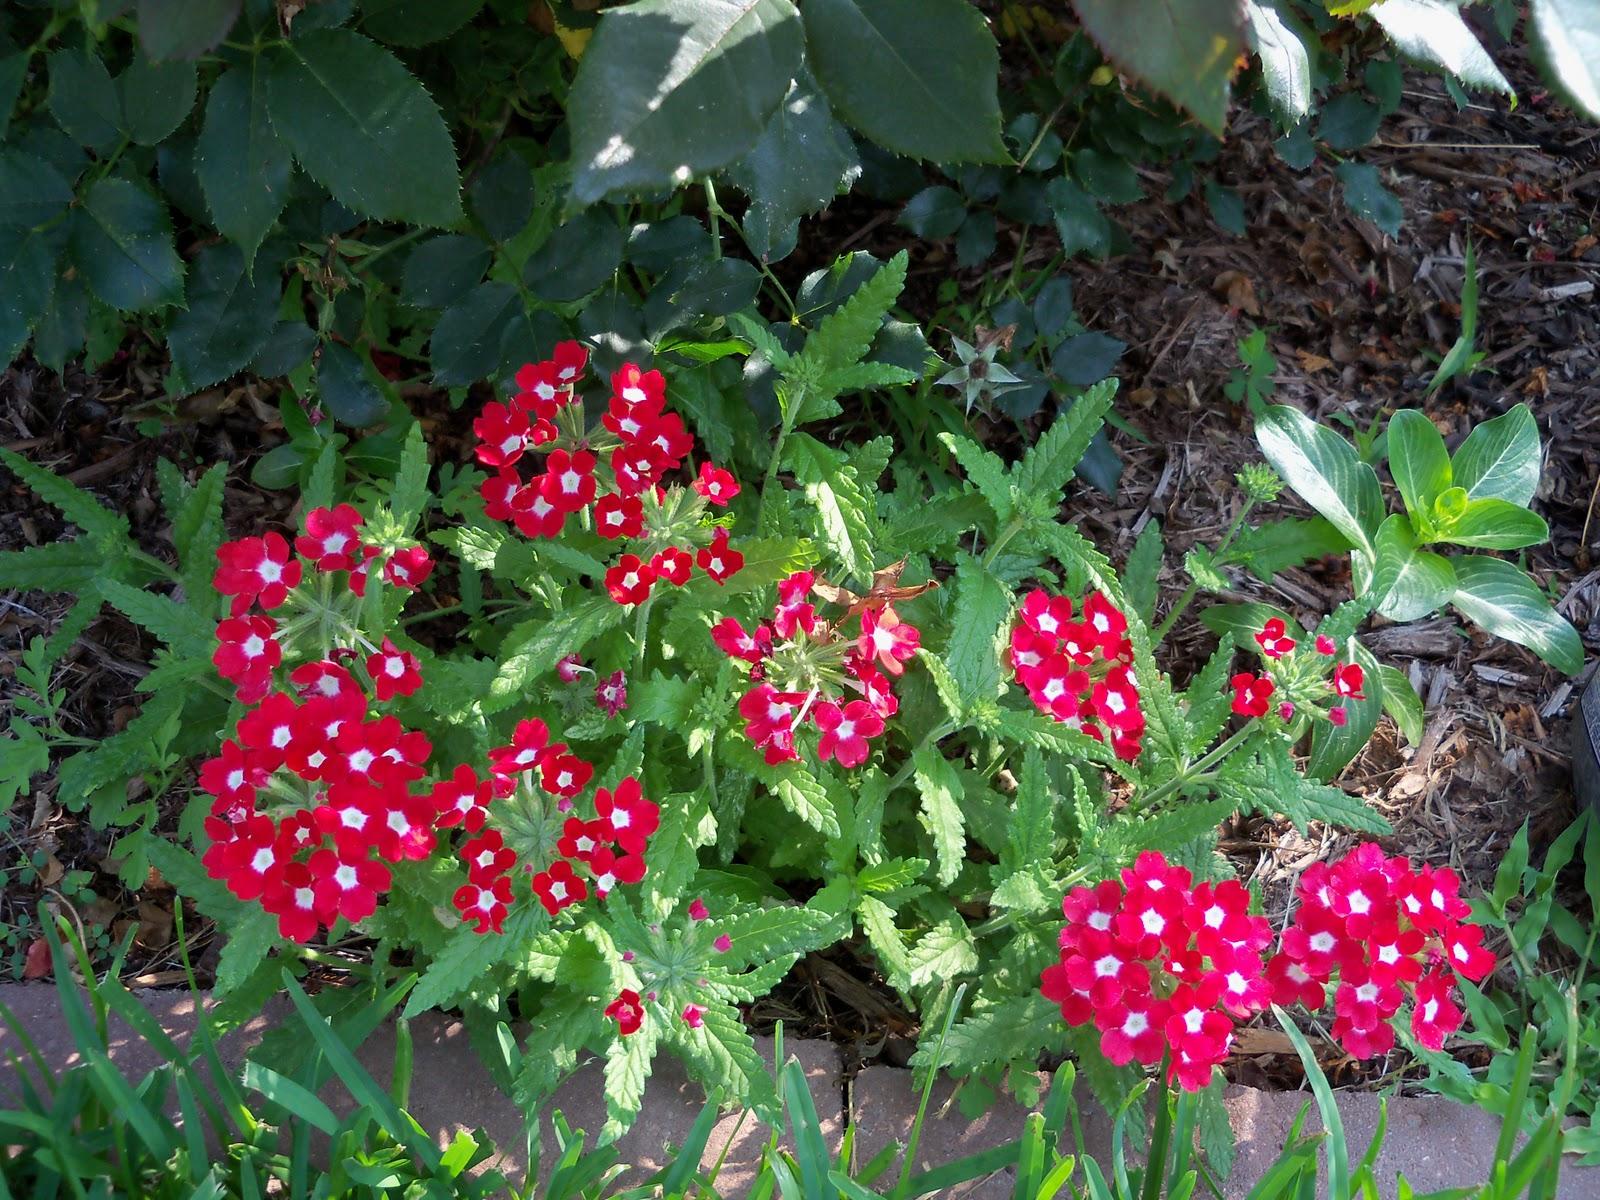 Gardening 2010, Part Two - 101_3089.JPG